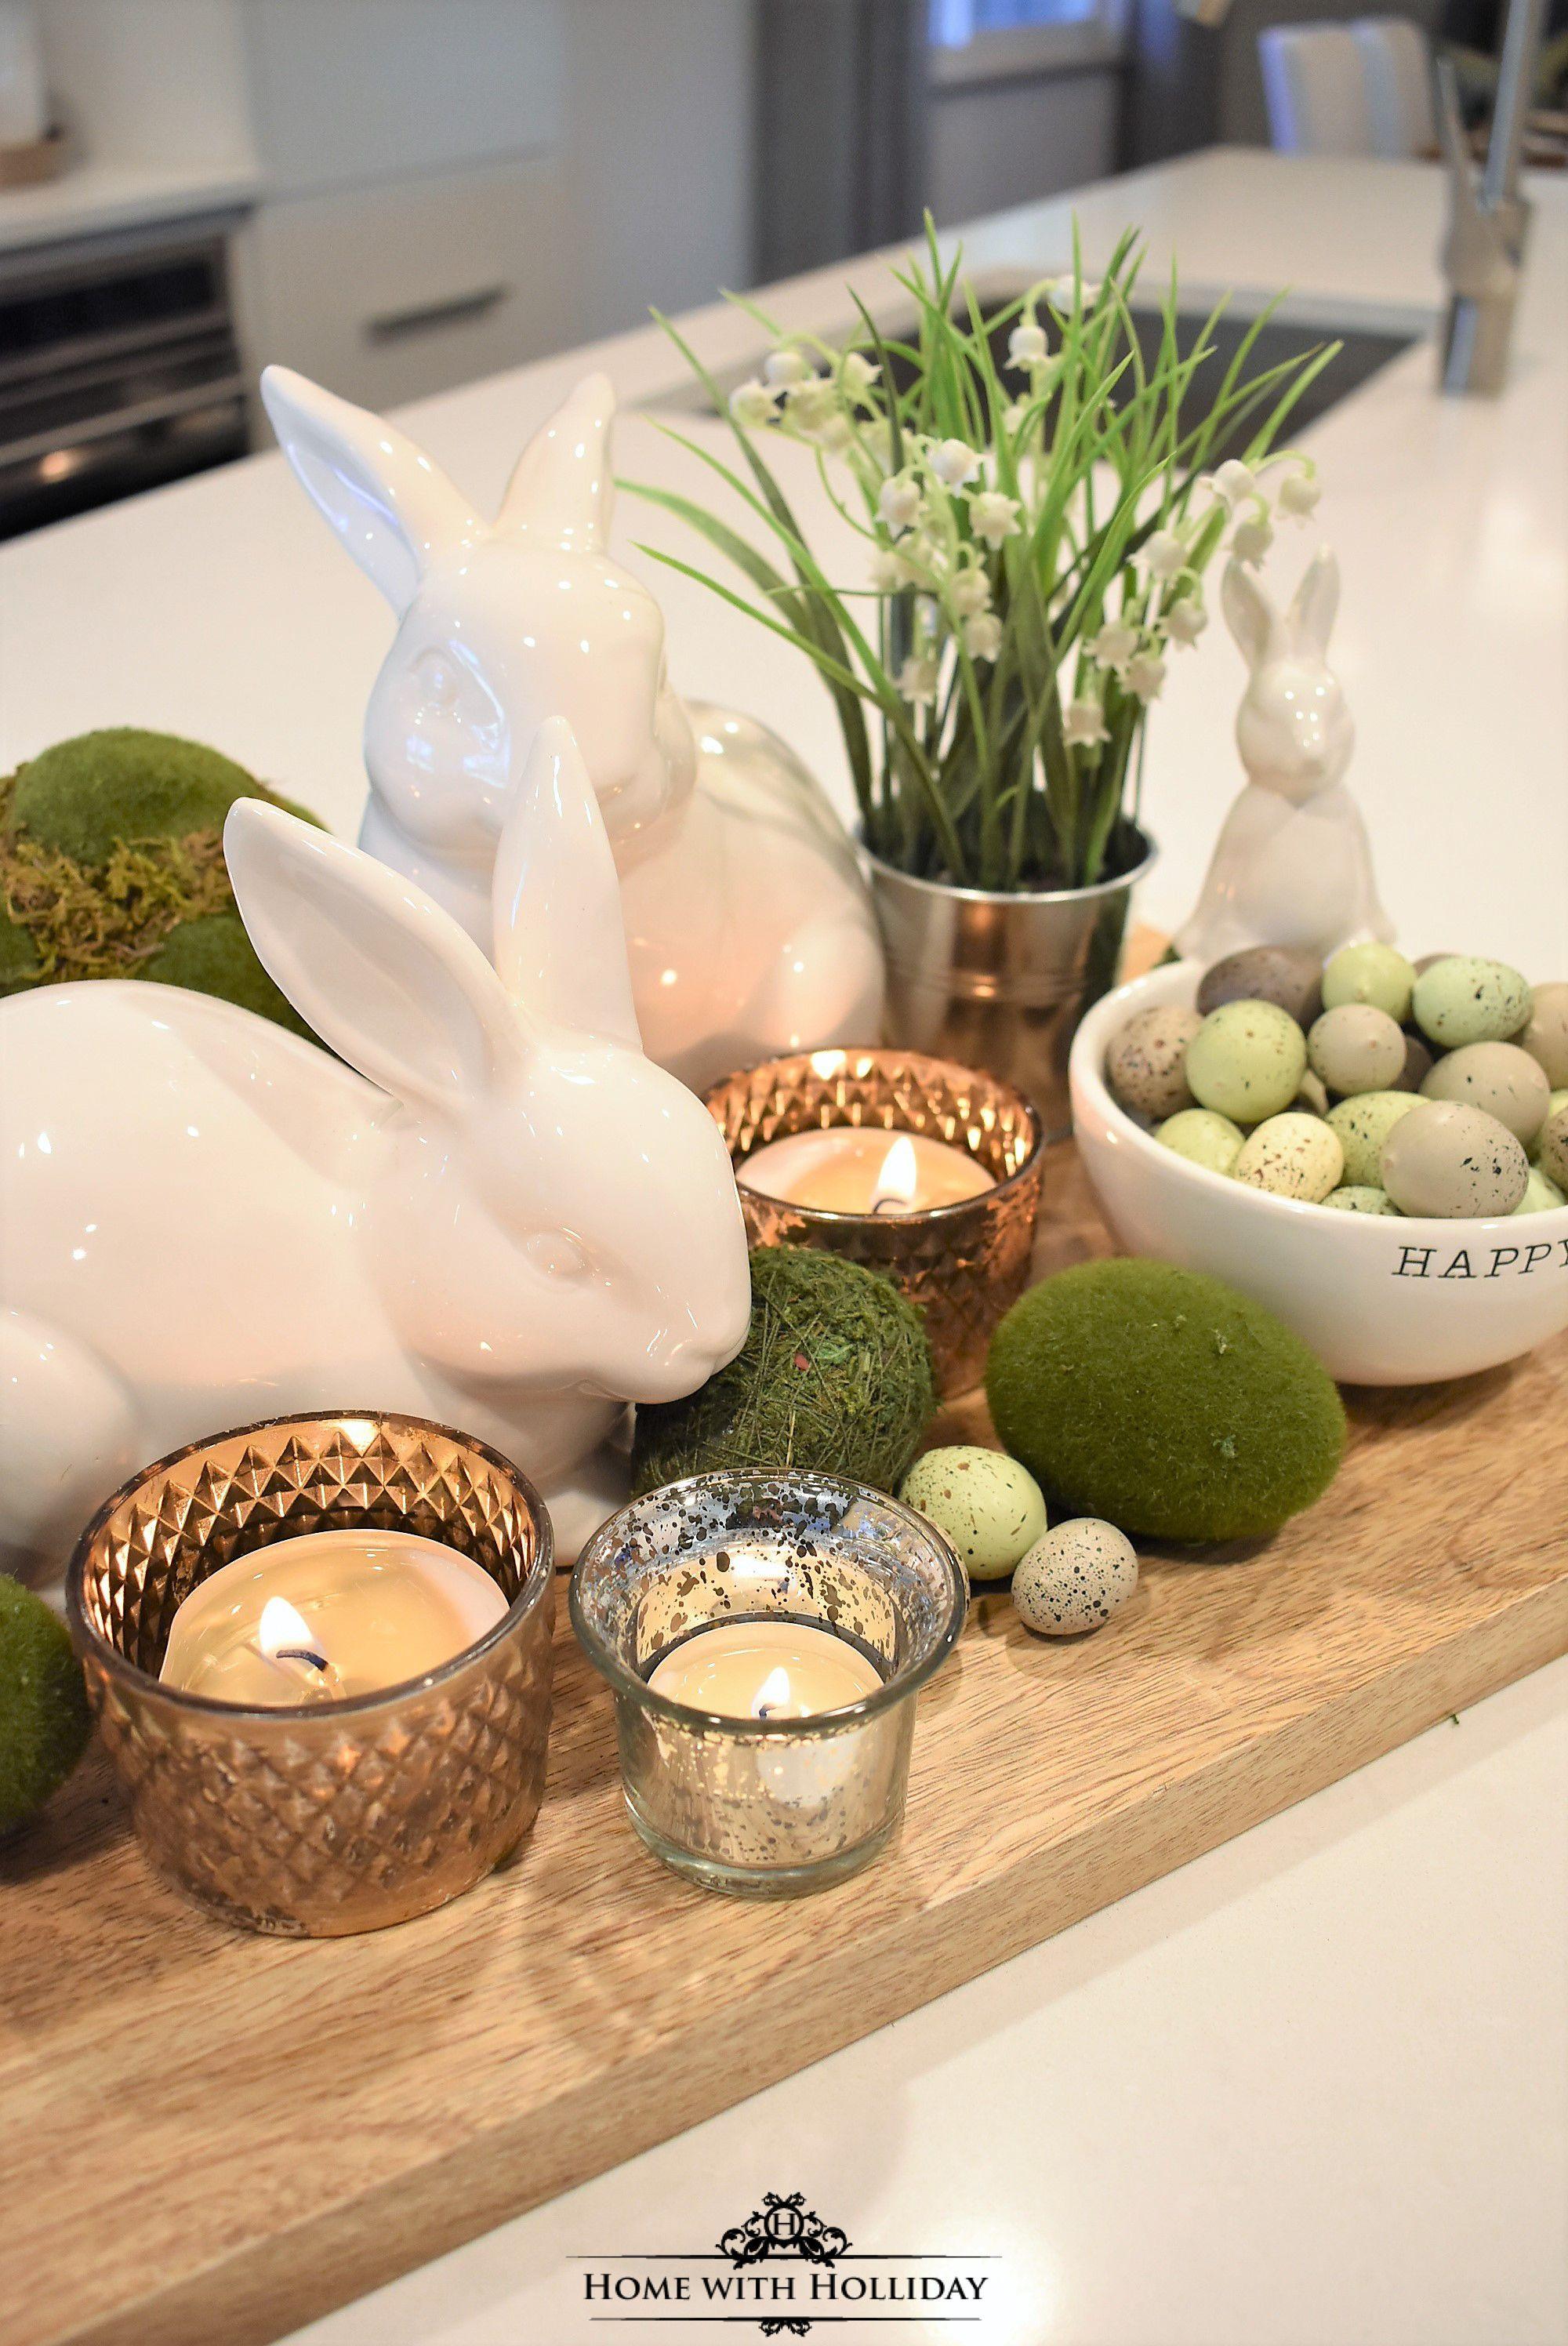 Easter Dinner 2019  Tips for Creating Simple Spring or Easter Decor